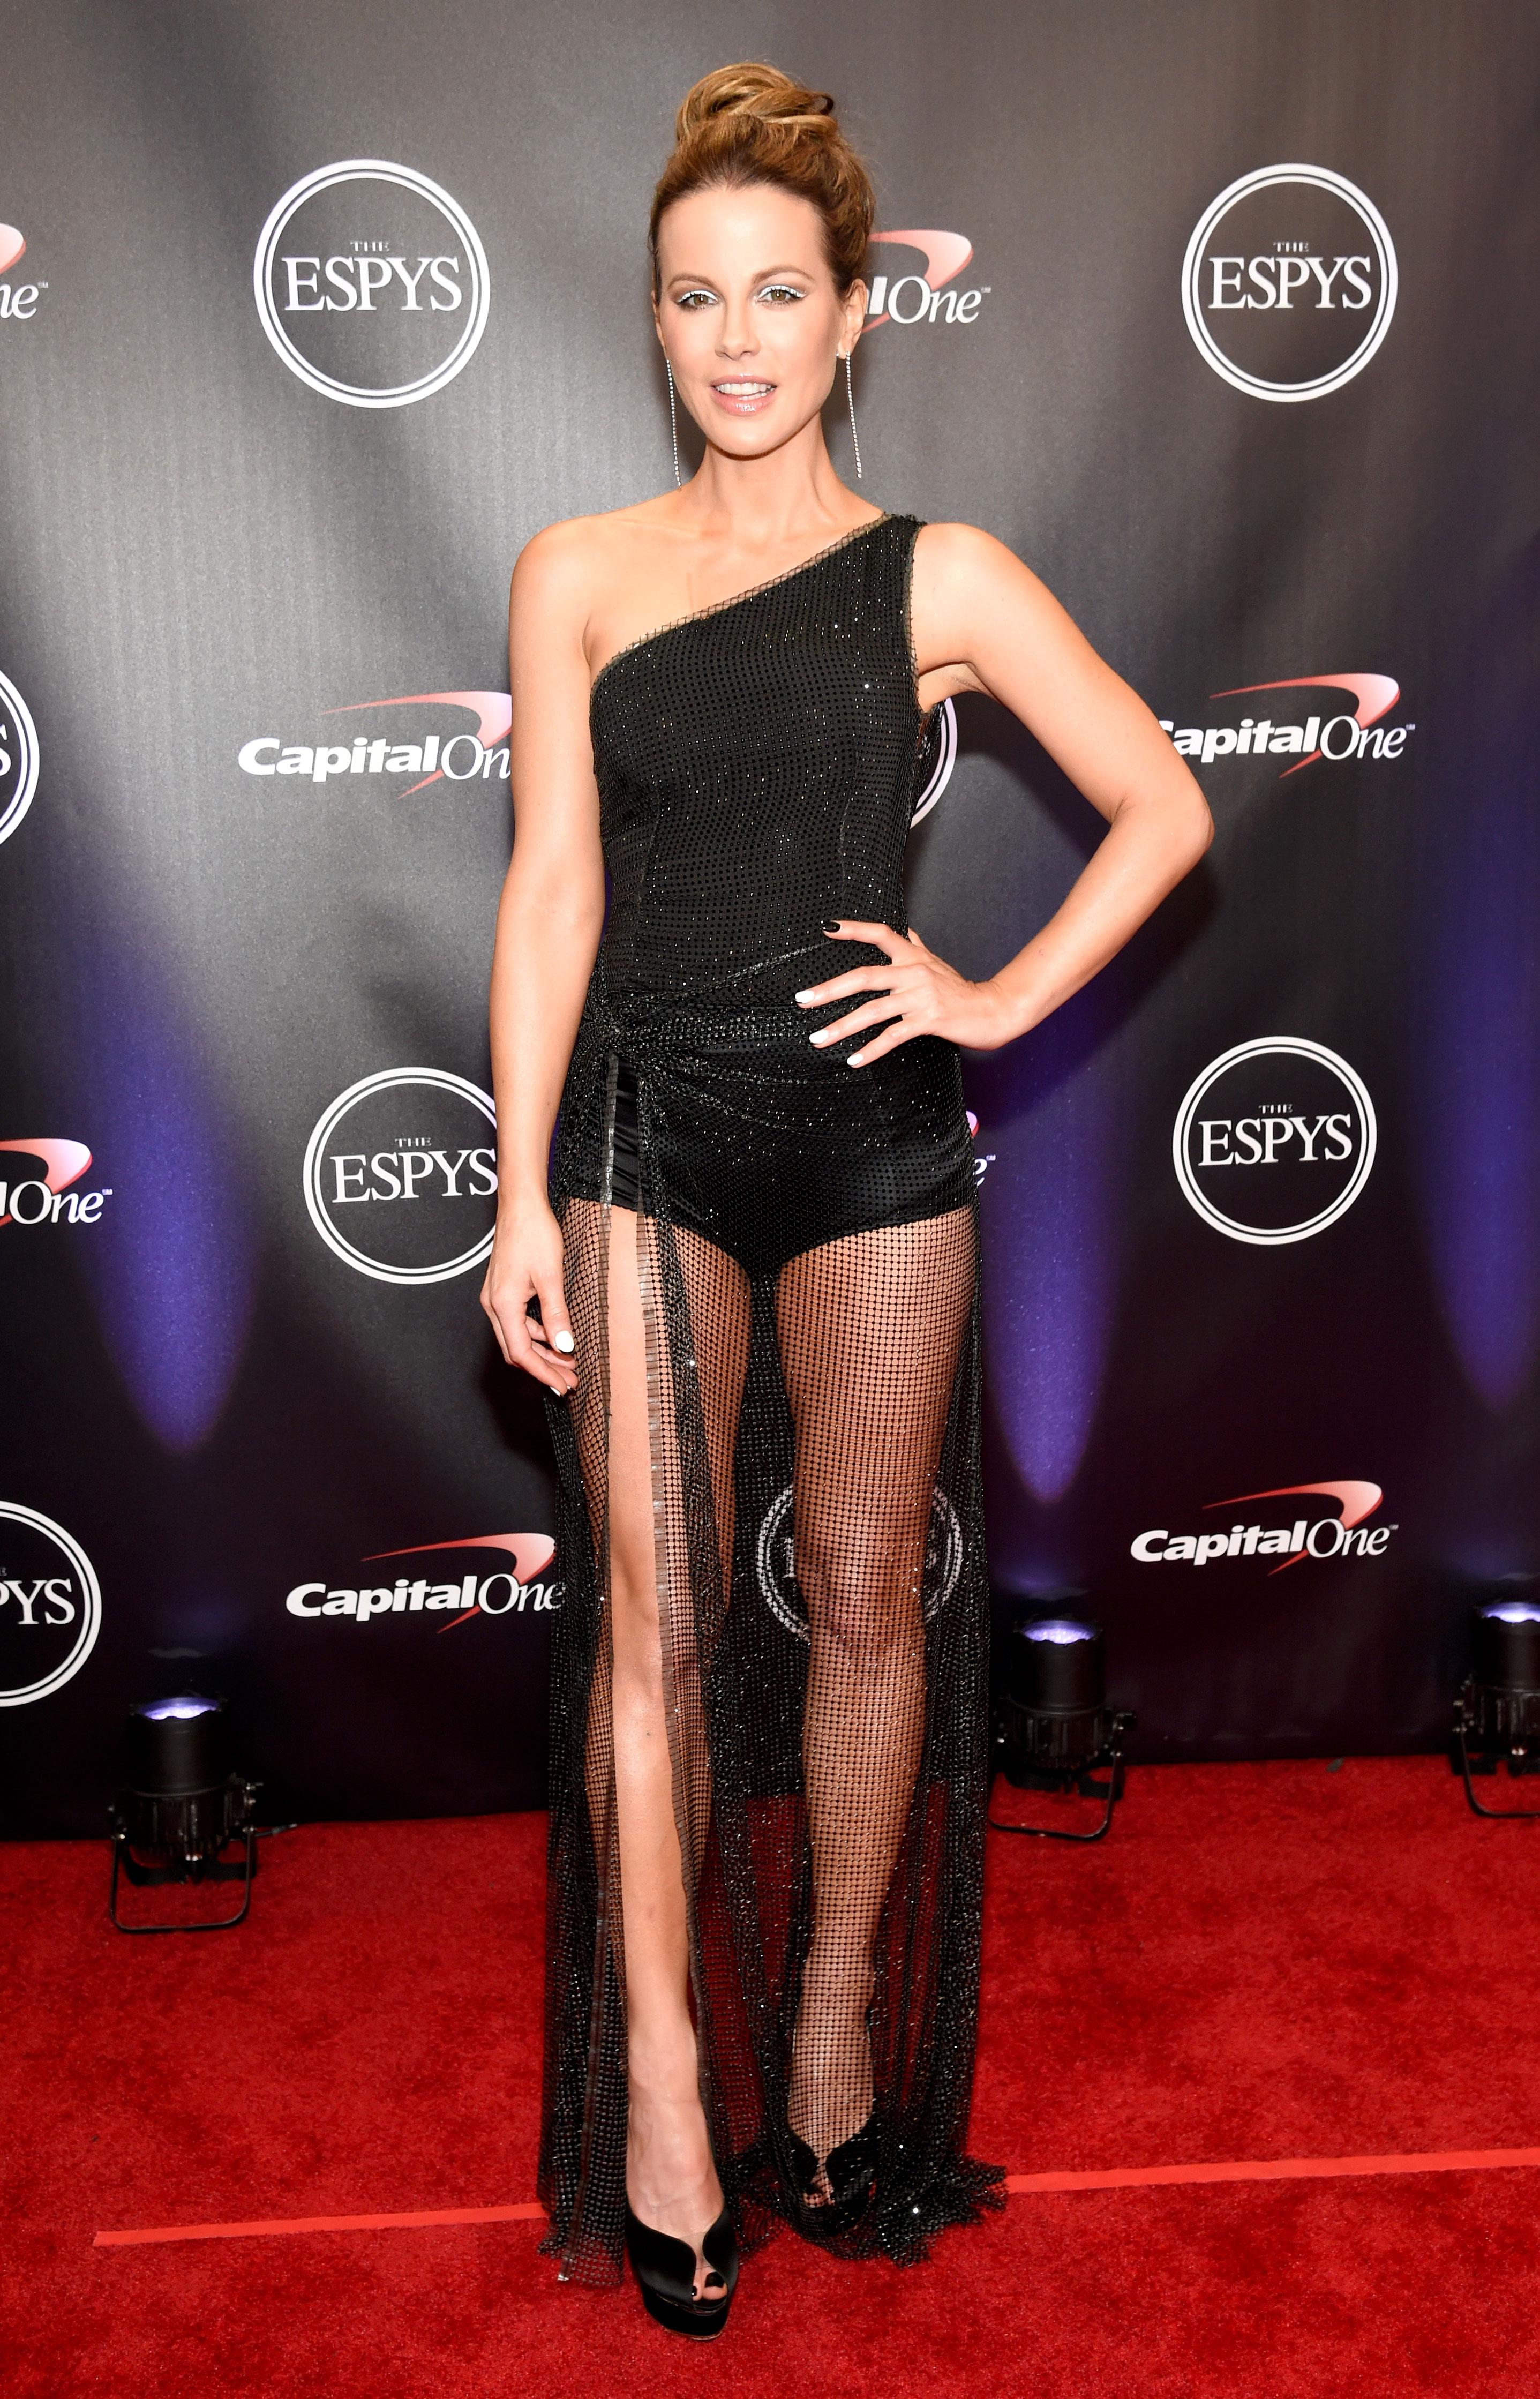 Kate-Beckinsale-espys - Wearing a black one-shoulder Alberta Ferretti dress with a sheer skirt.